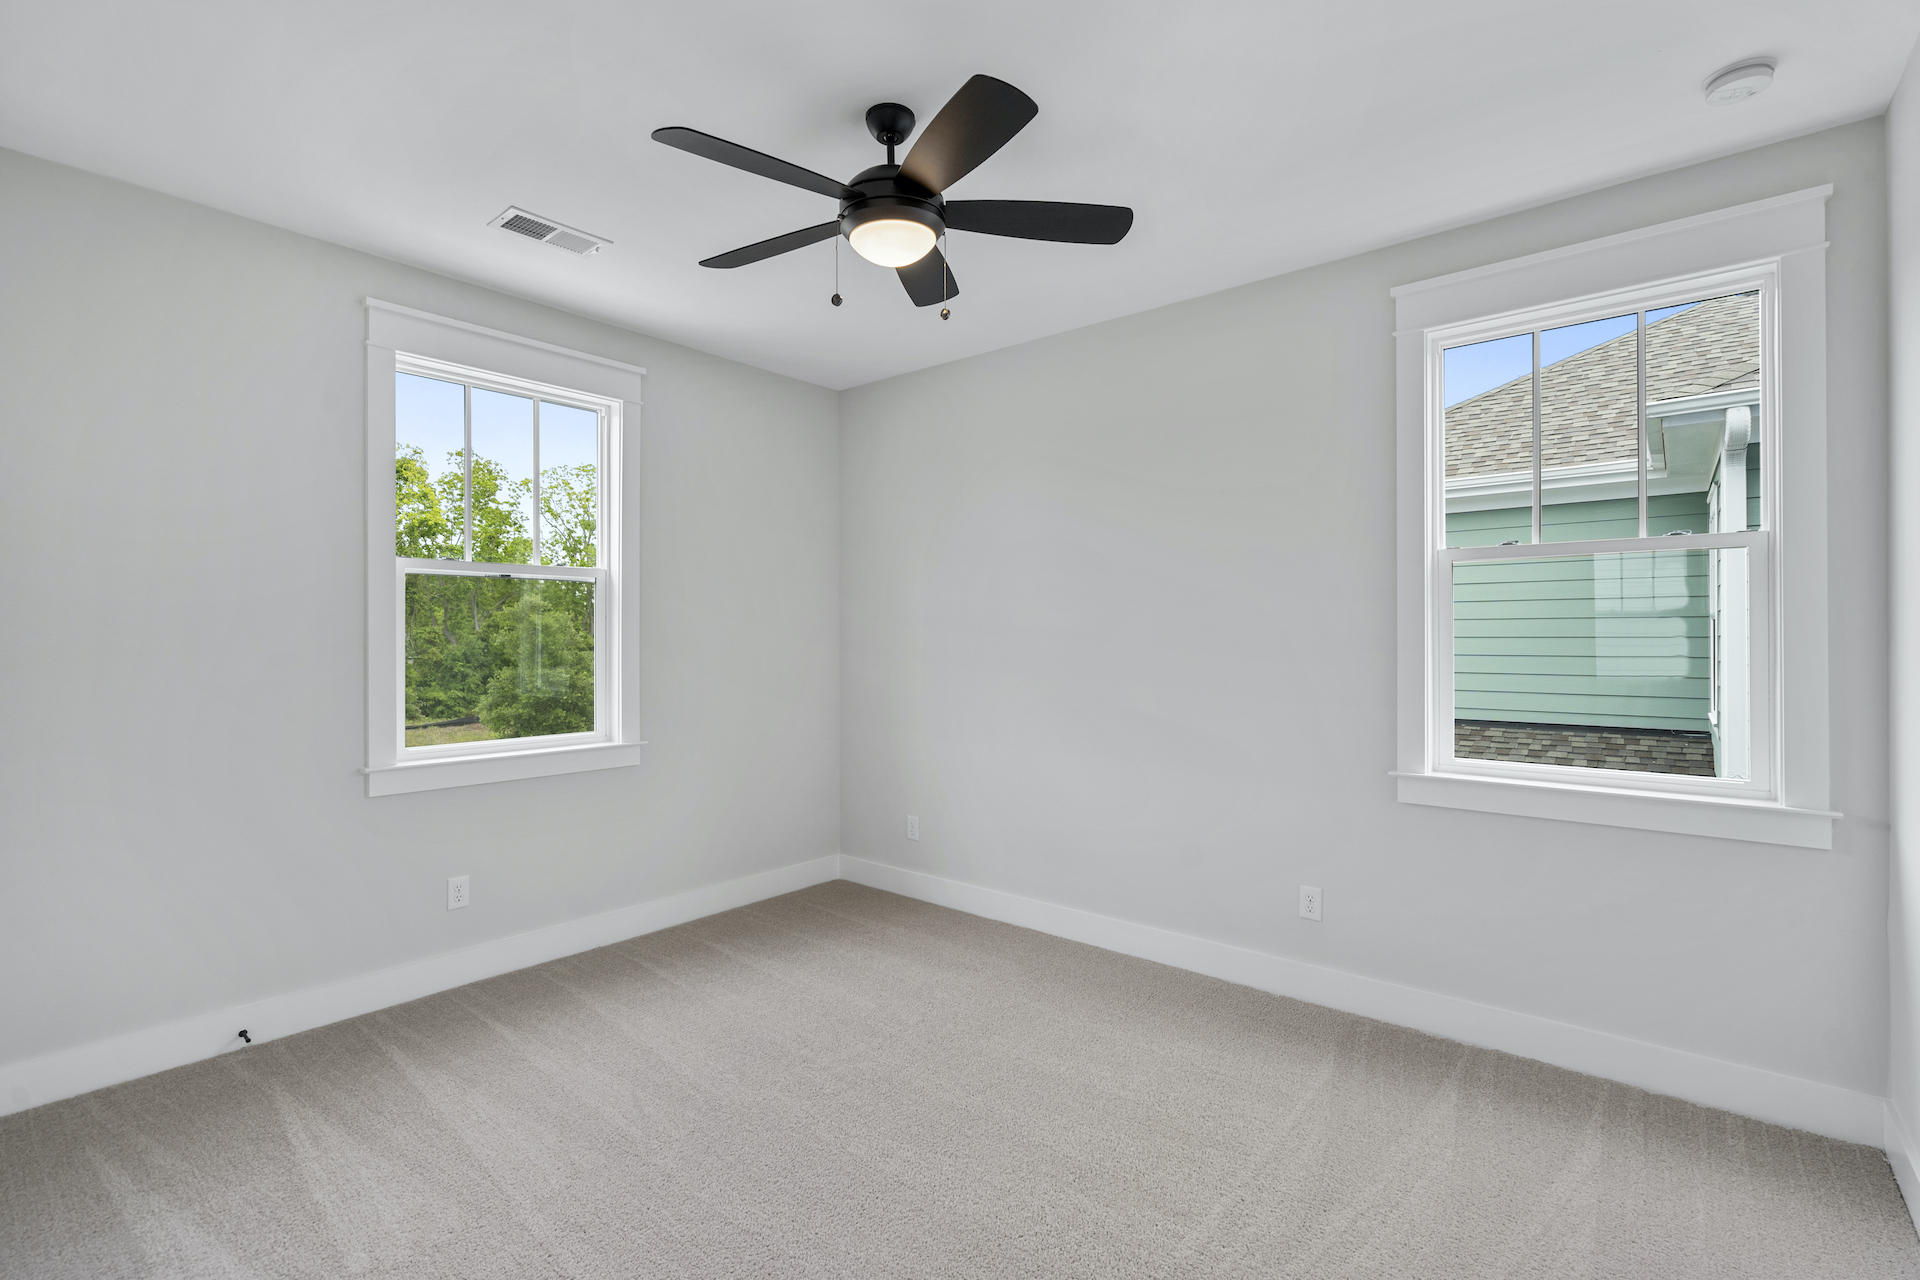 Midtown Homes For Sale - 1344 Upper Union, Mount Pleasant, SC - 43